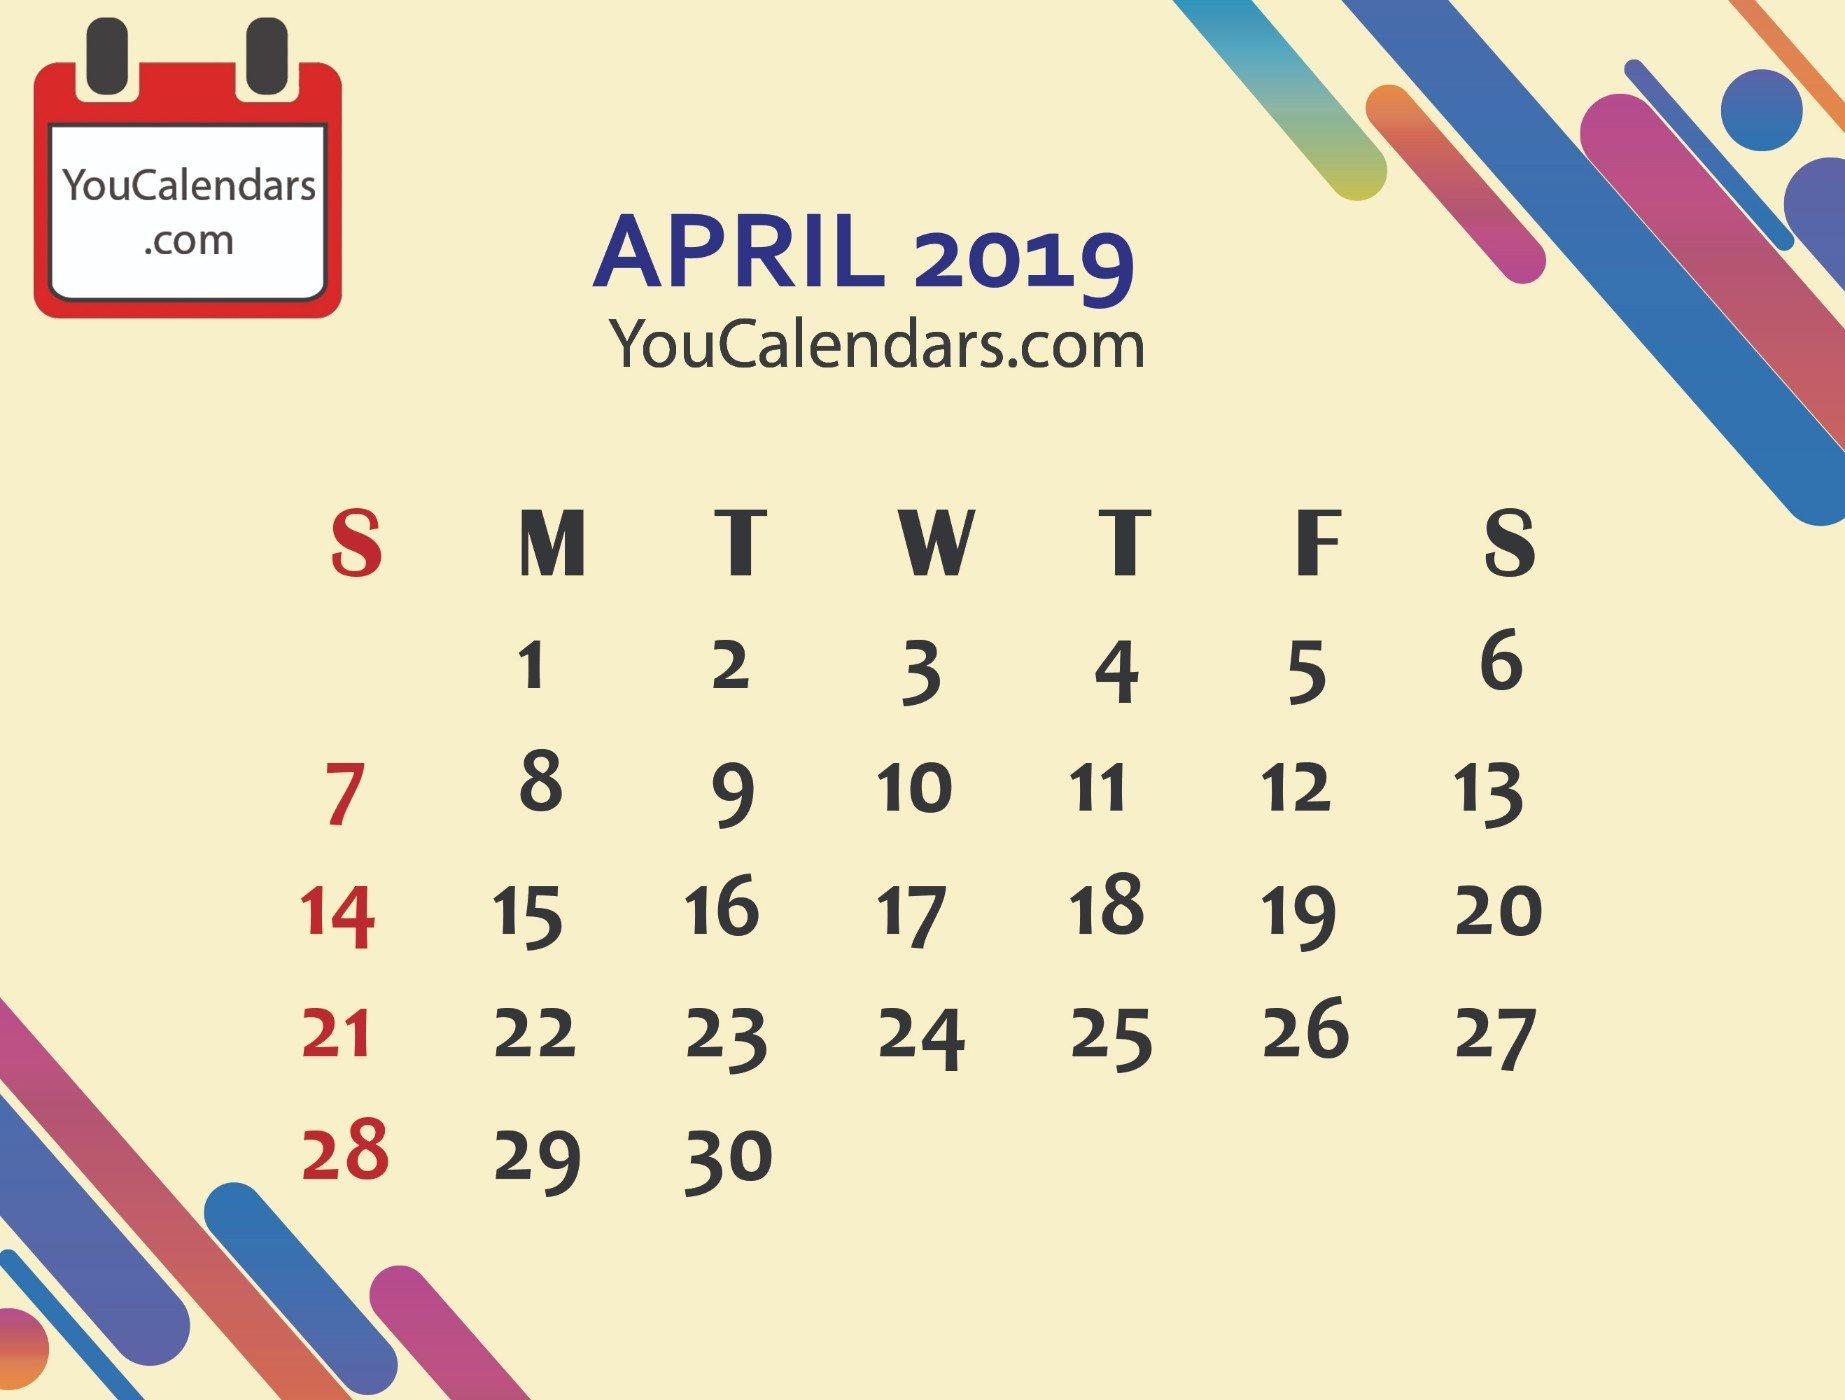 ✅Free April 2019 Calendar Printable Template – You Calendars April 6 2019 Calendar